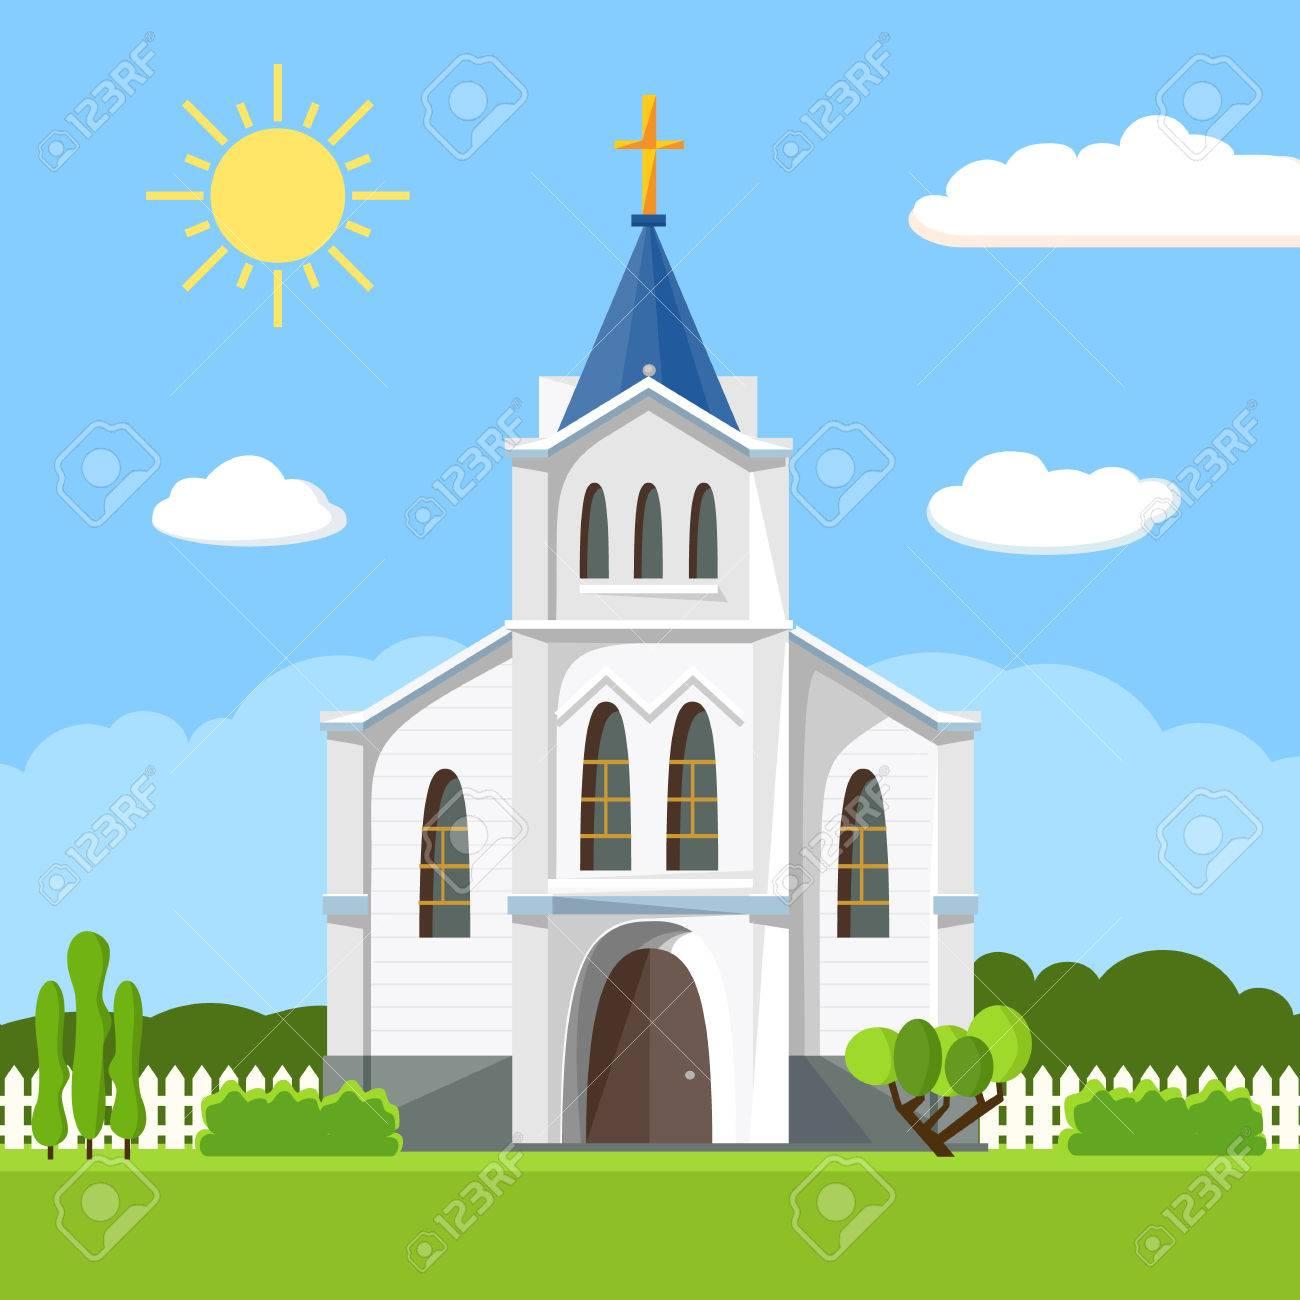 Church icon. Flat summer landscape. - 79805028